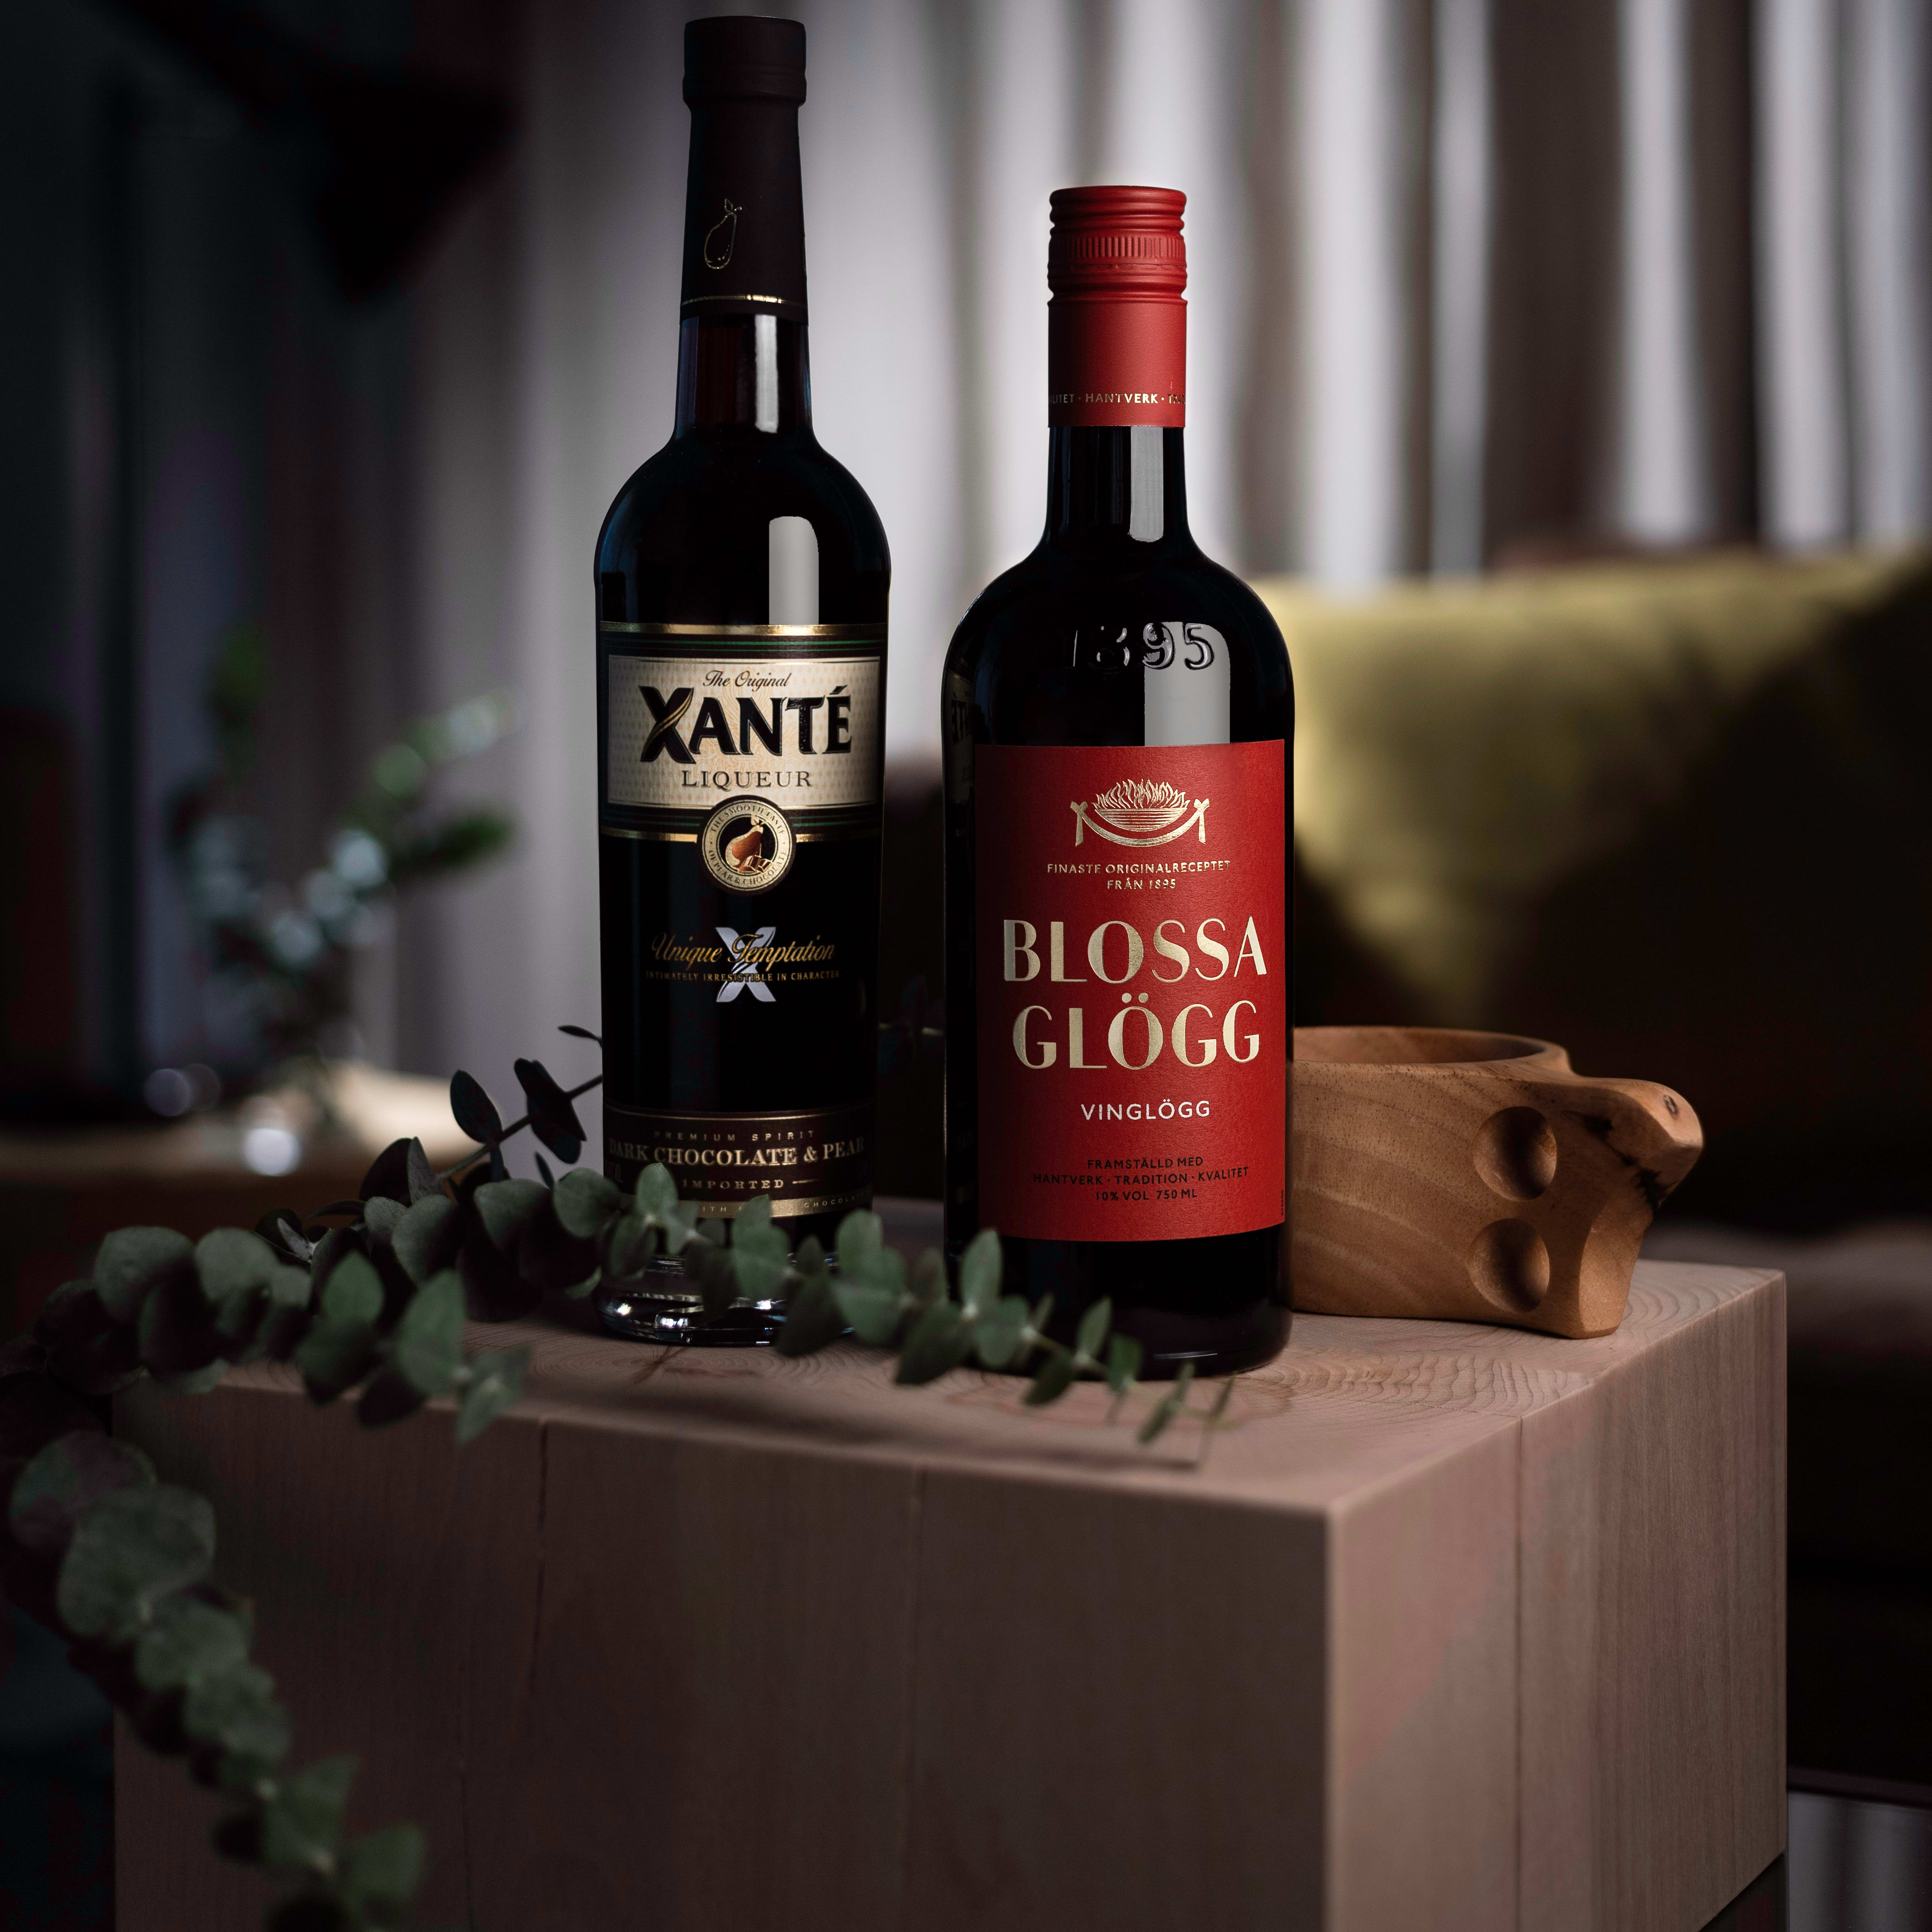 Warm drinks bundle with Blossa Glögg and Xanté Liqueur